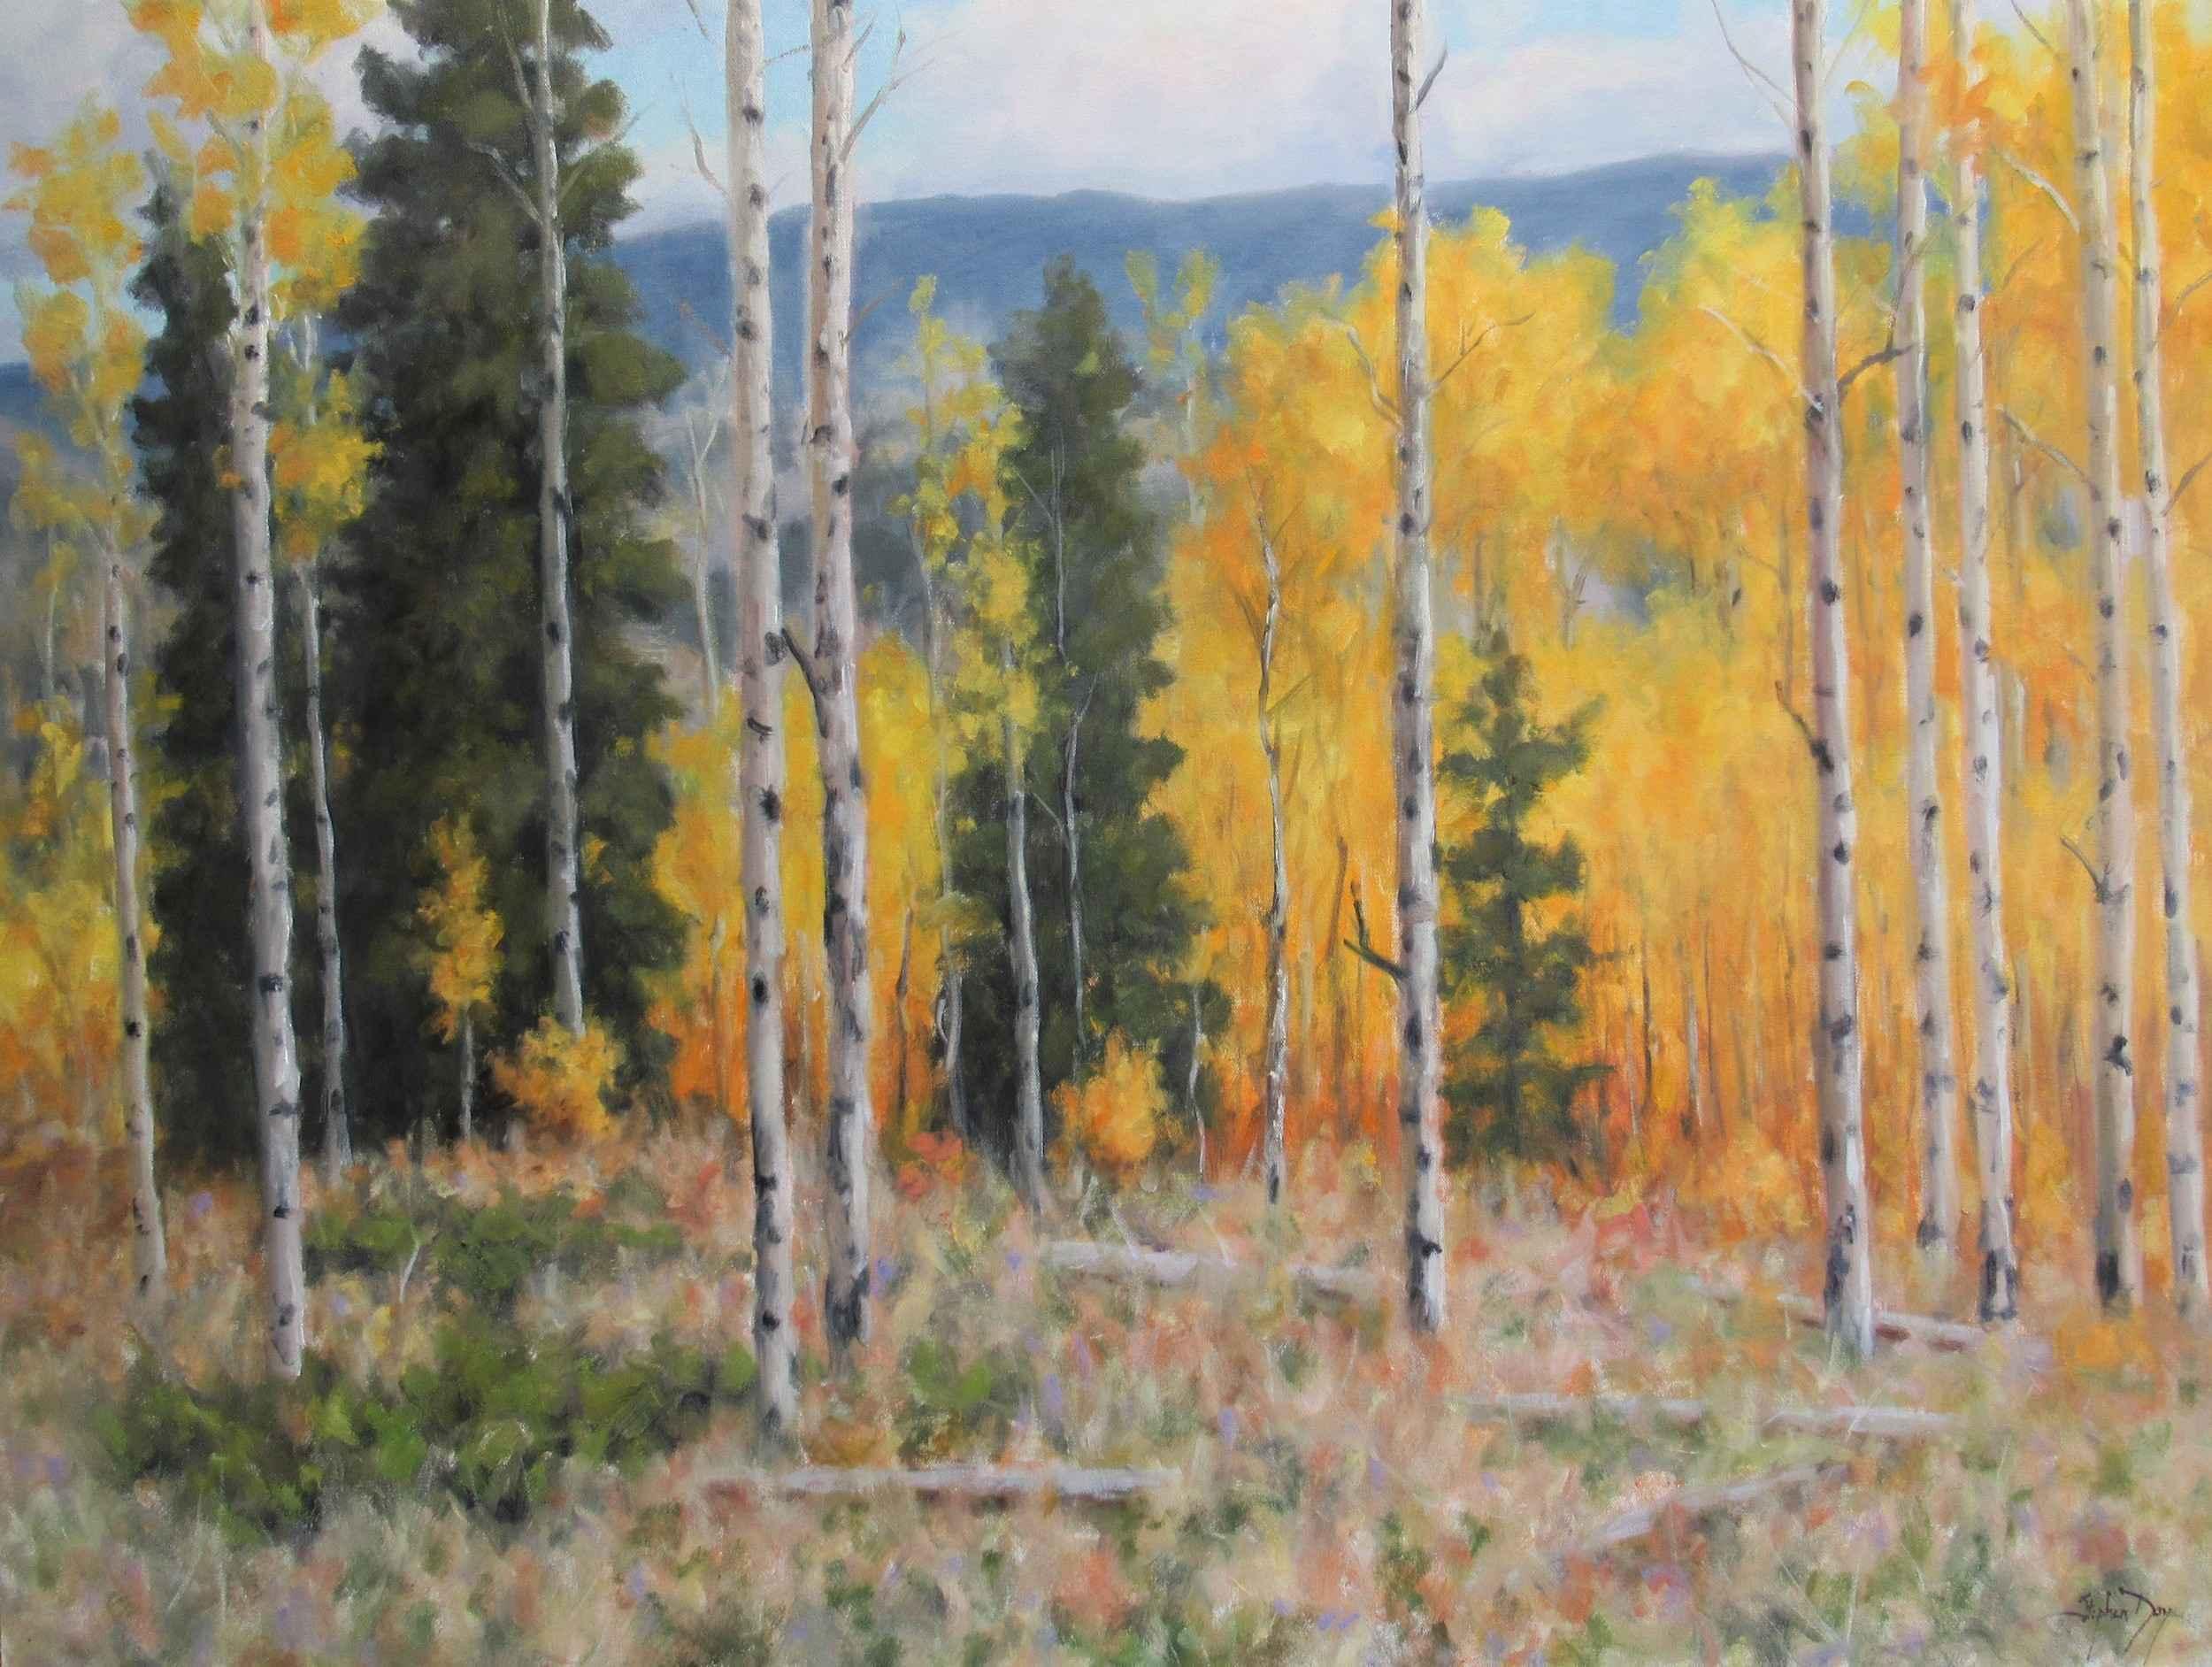 Stephen Day. Artist Workshop. Sorrel Sky Gallery. Santa Fe Art gallery. Durango Art Gallery.